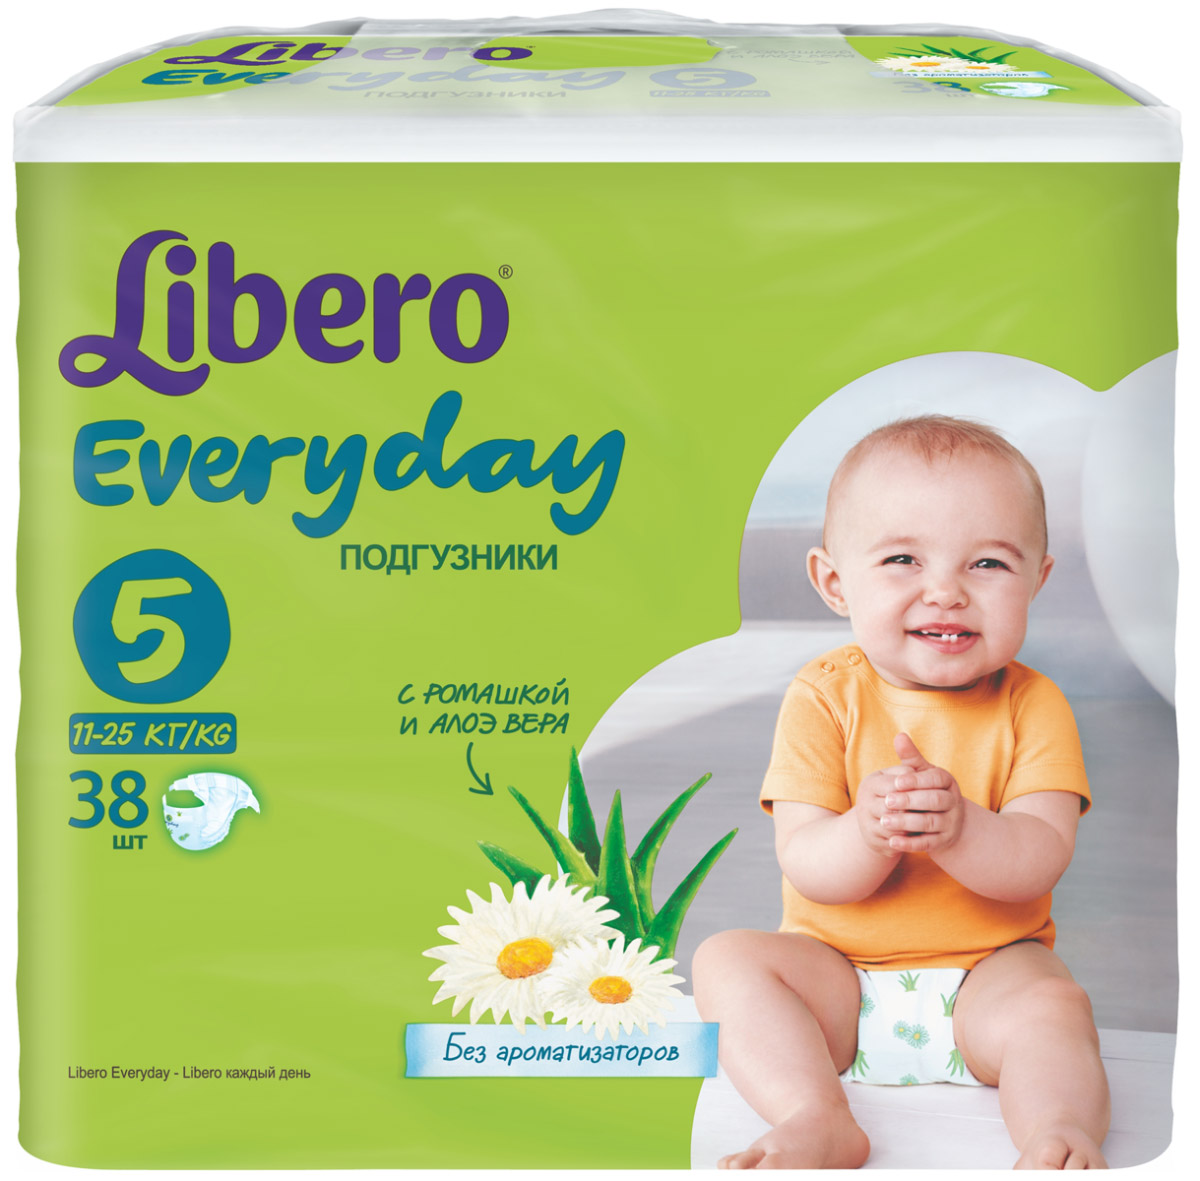 Libero Подгузники Everyday Size 5 (11-25 кг) 38 шт libero подгузники everyday size 5 11 25 кг 38 шт